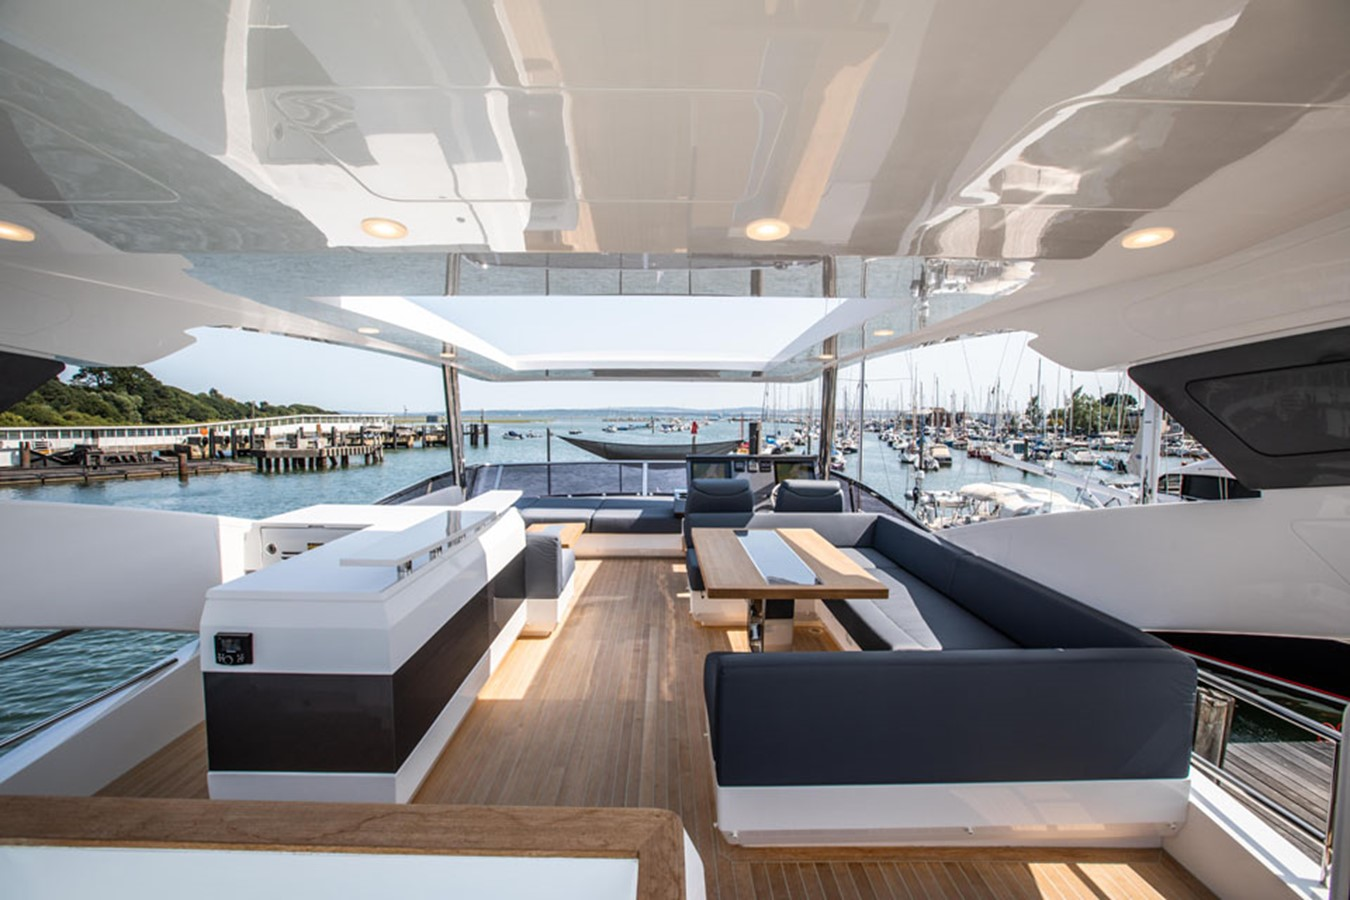 2019 PEARL MOTOR YACHTS Pearl 80 Motor Yacht 2615333